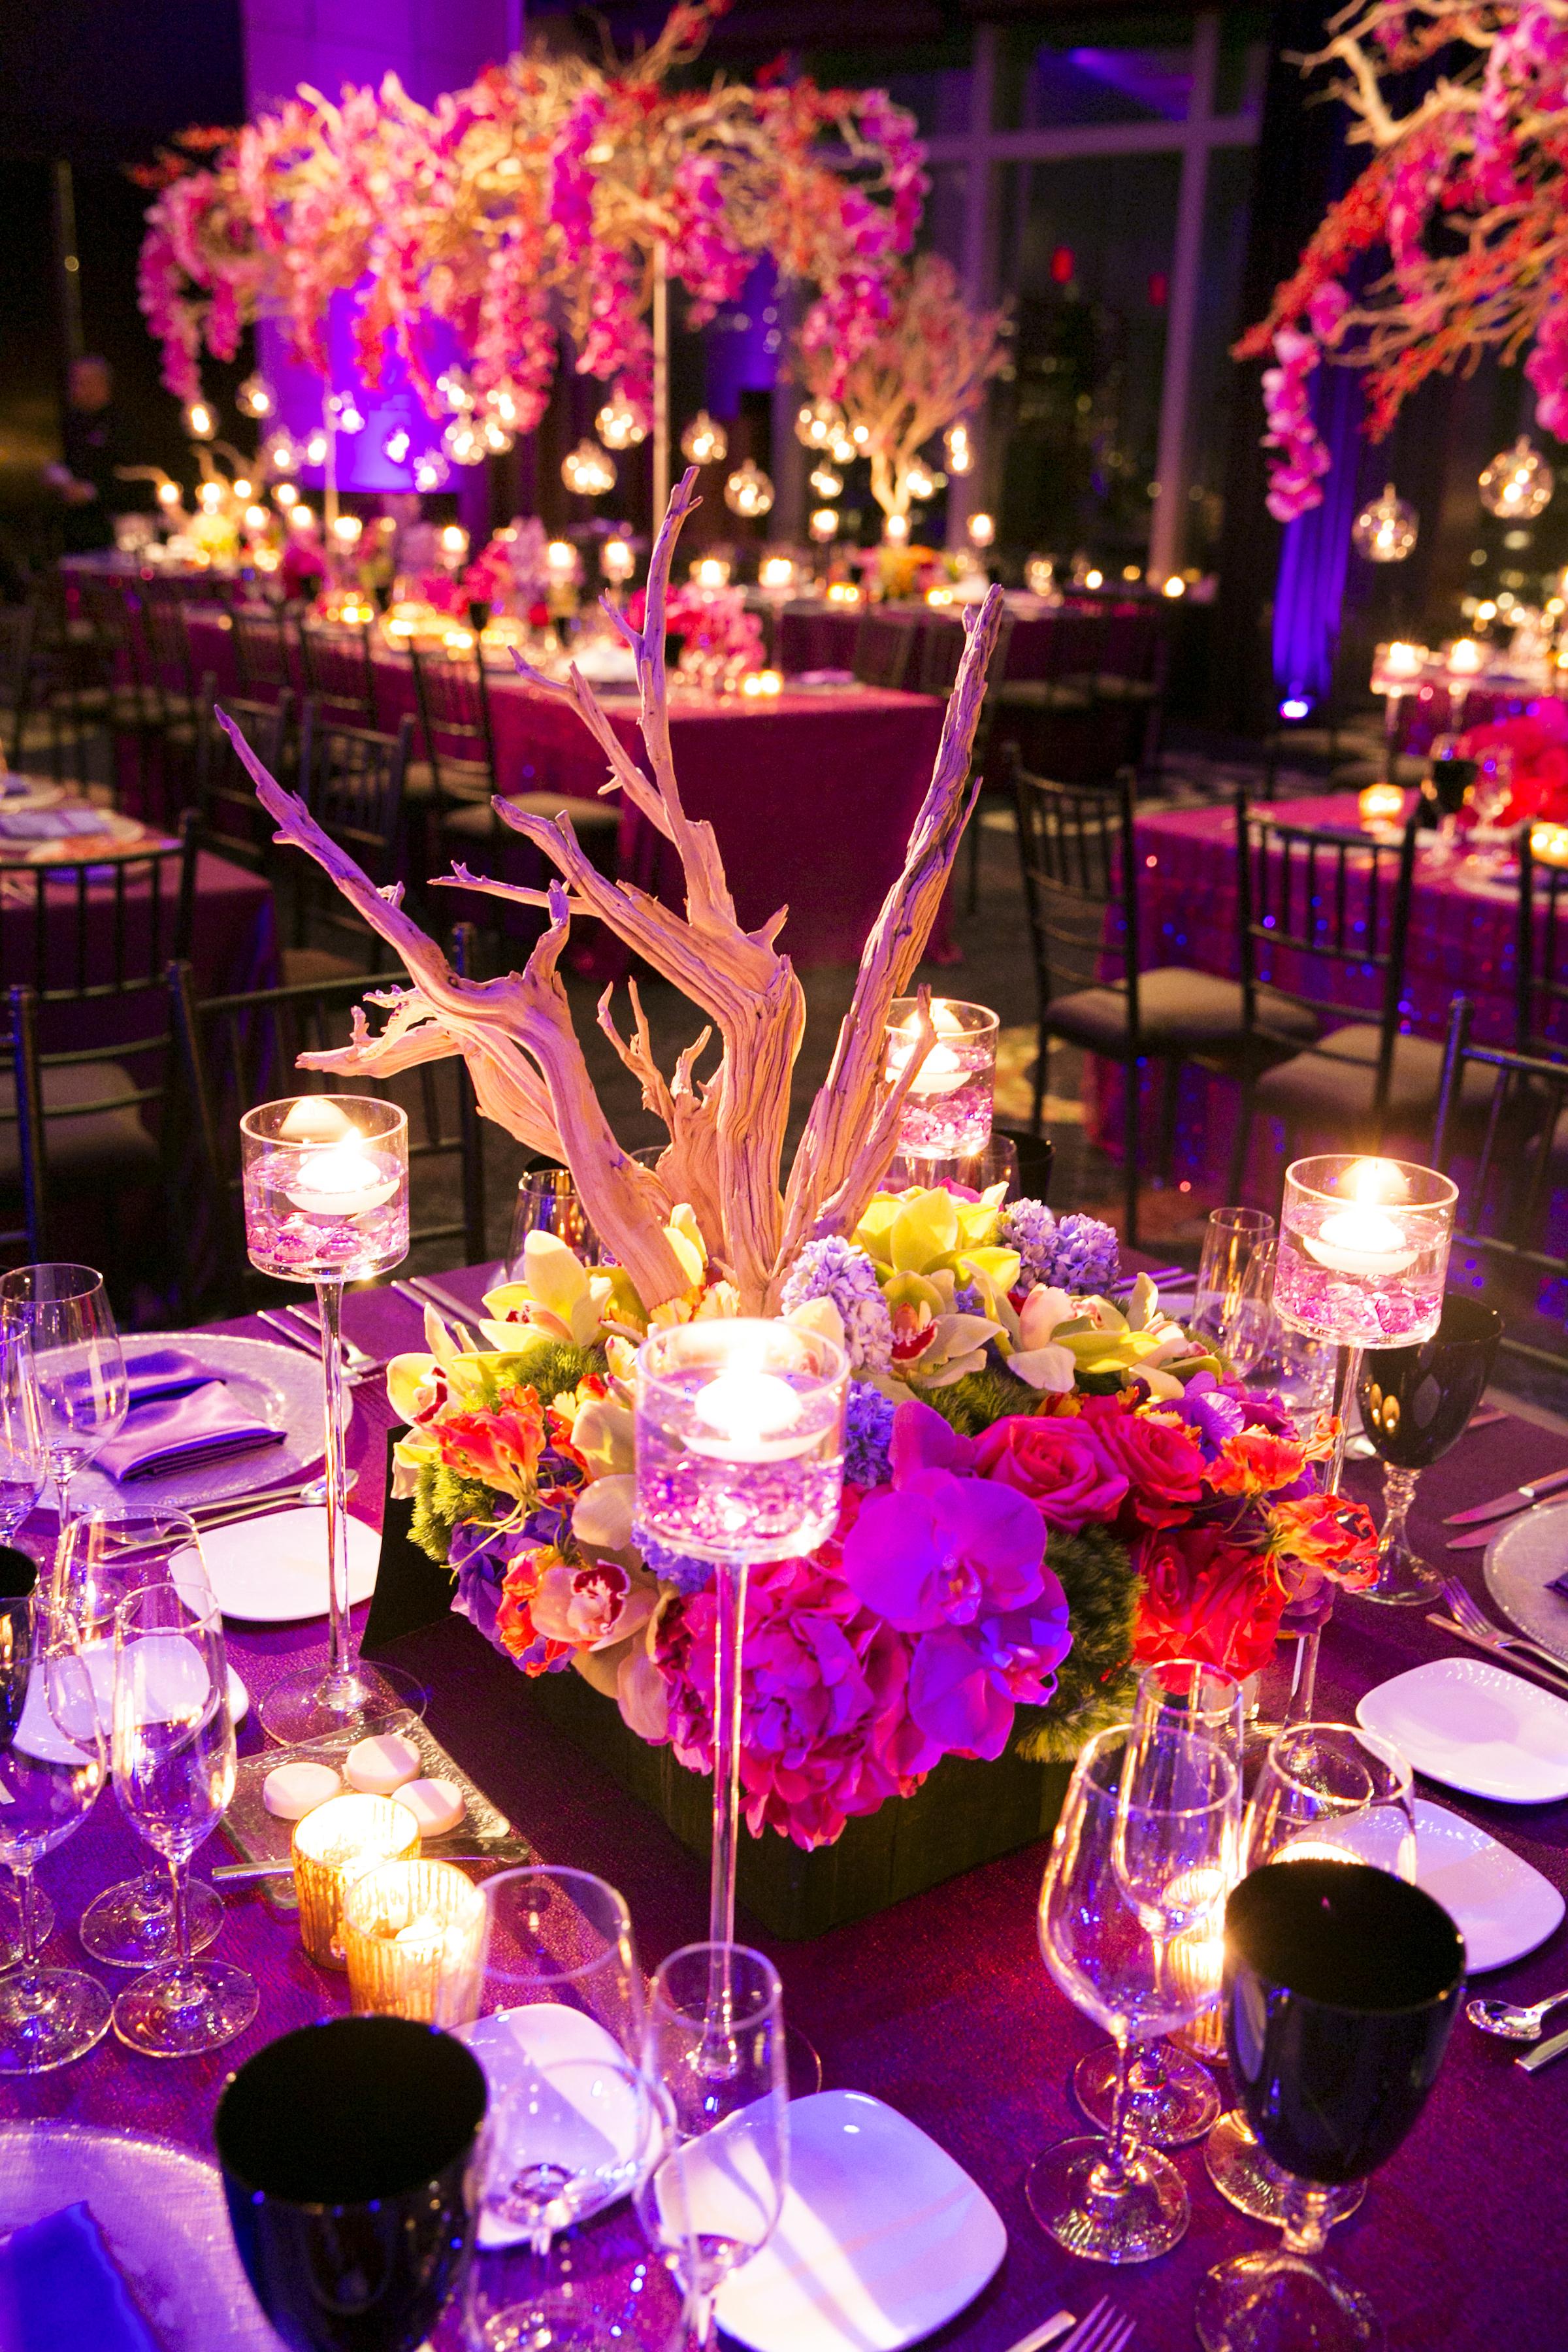 NYC-Wedding-Planner-Andrea-Freeman-Events-Mandarin-Oriental-13.jpg